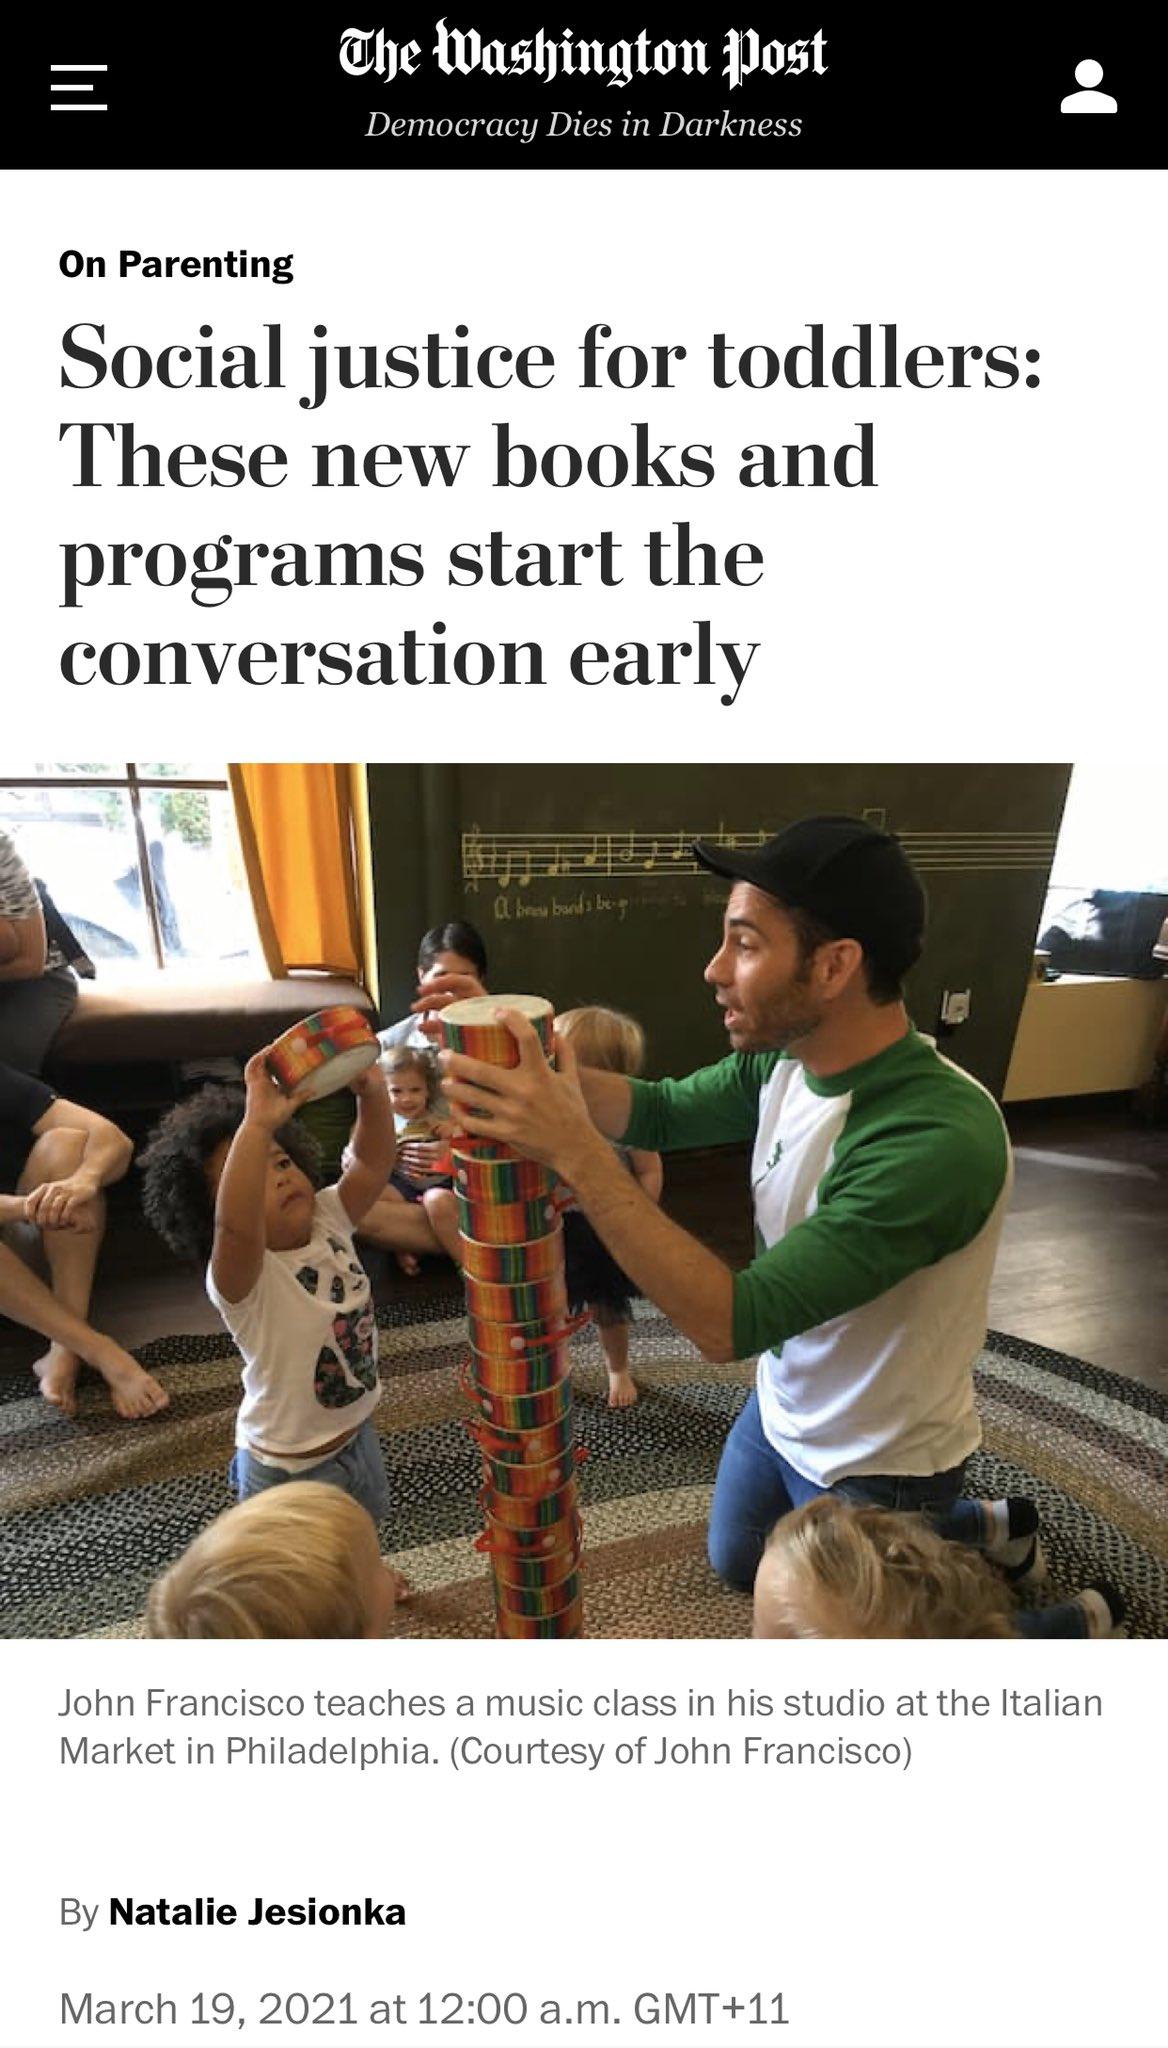 wapoindoctrination.jpg